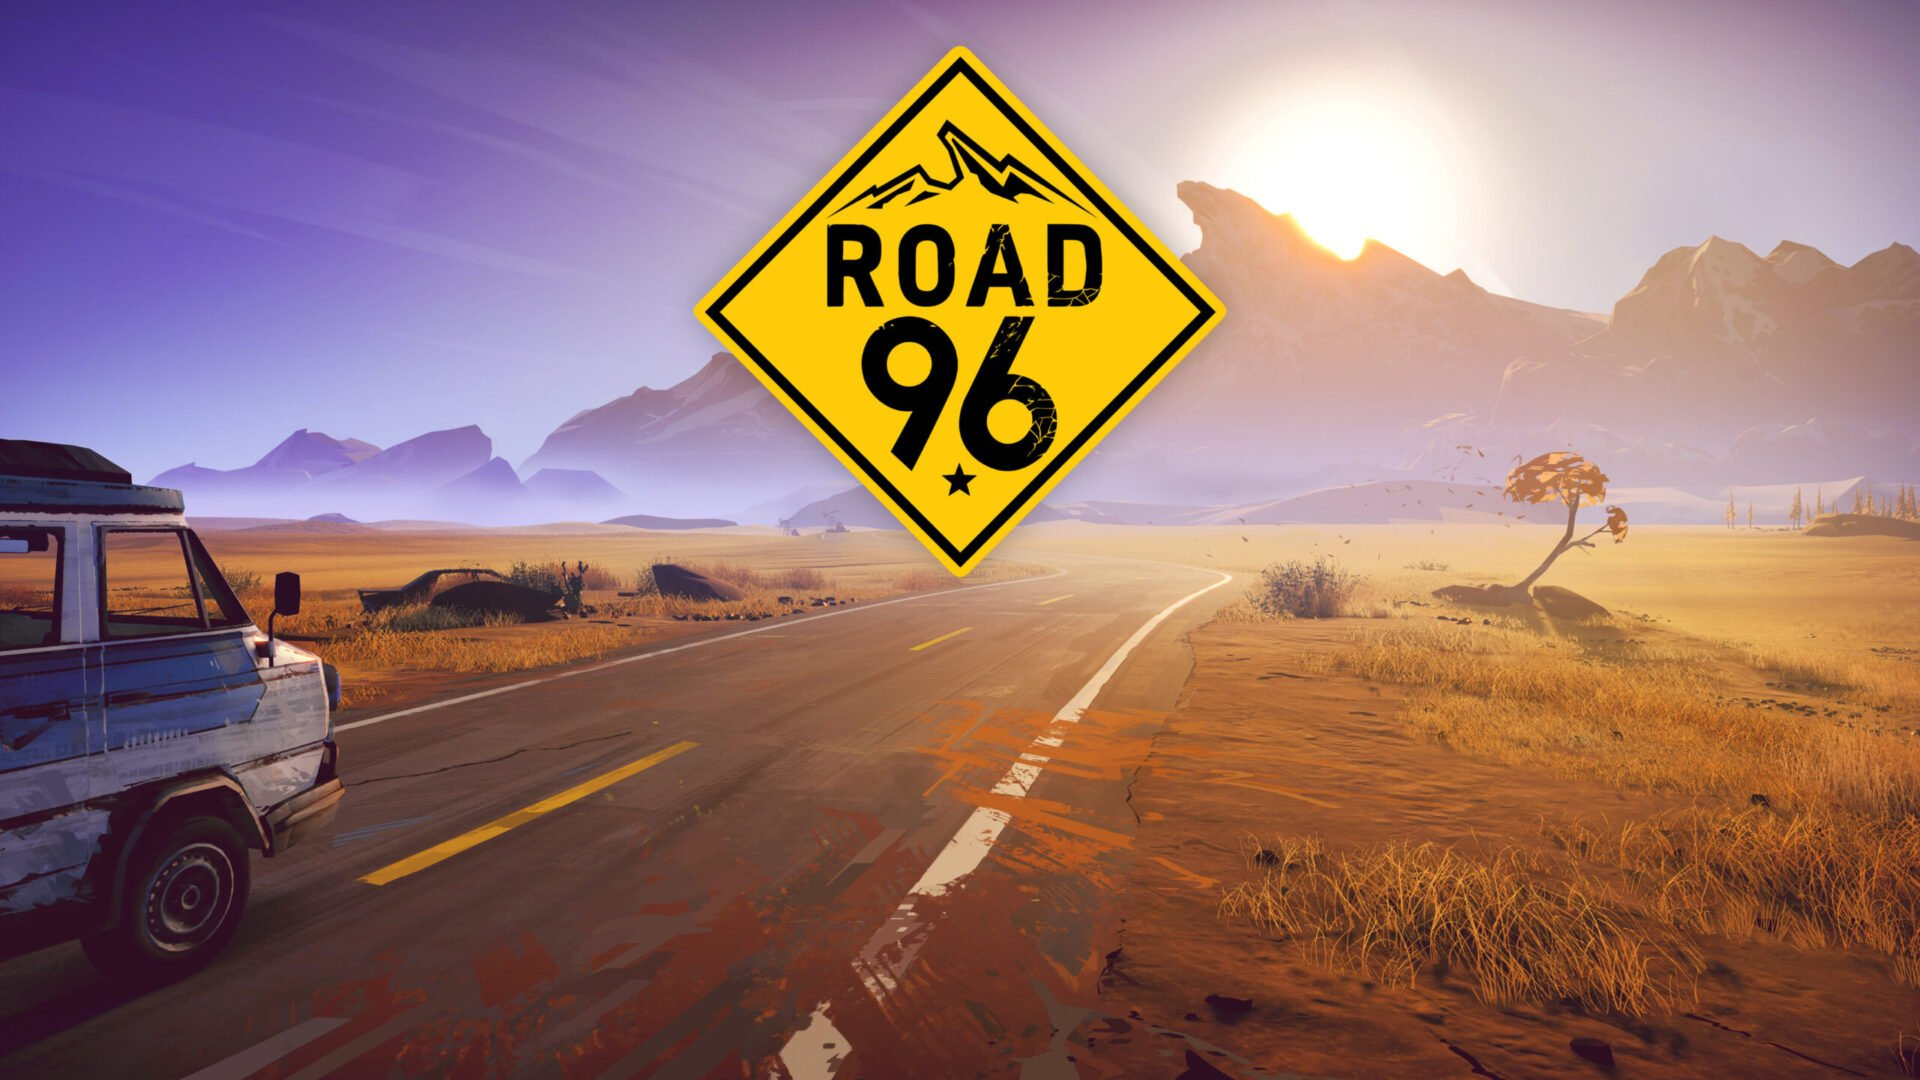 road-96-yoan-interview